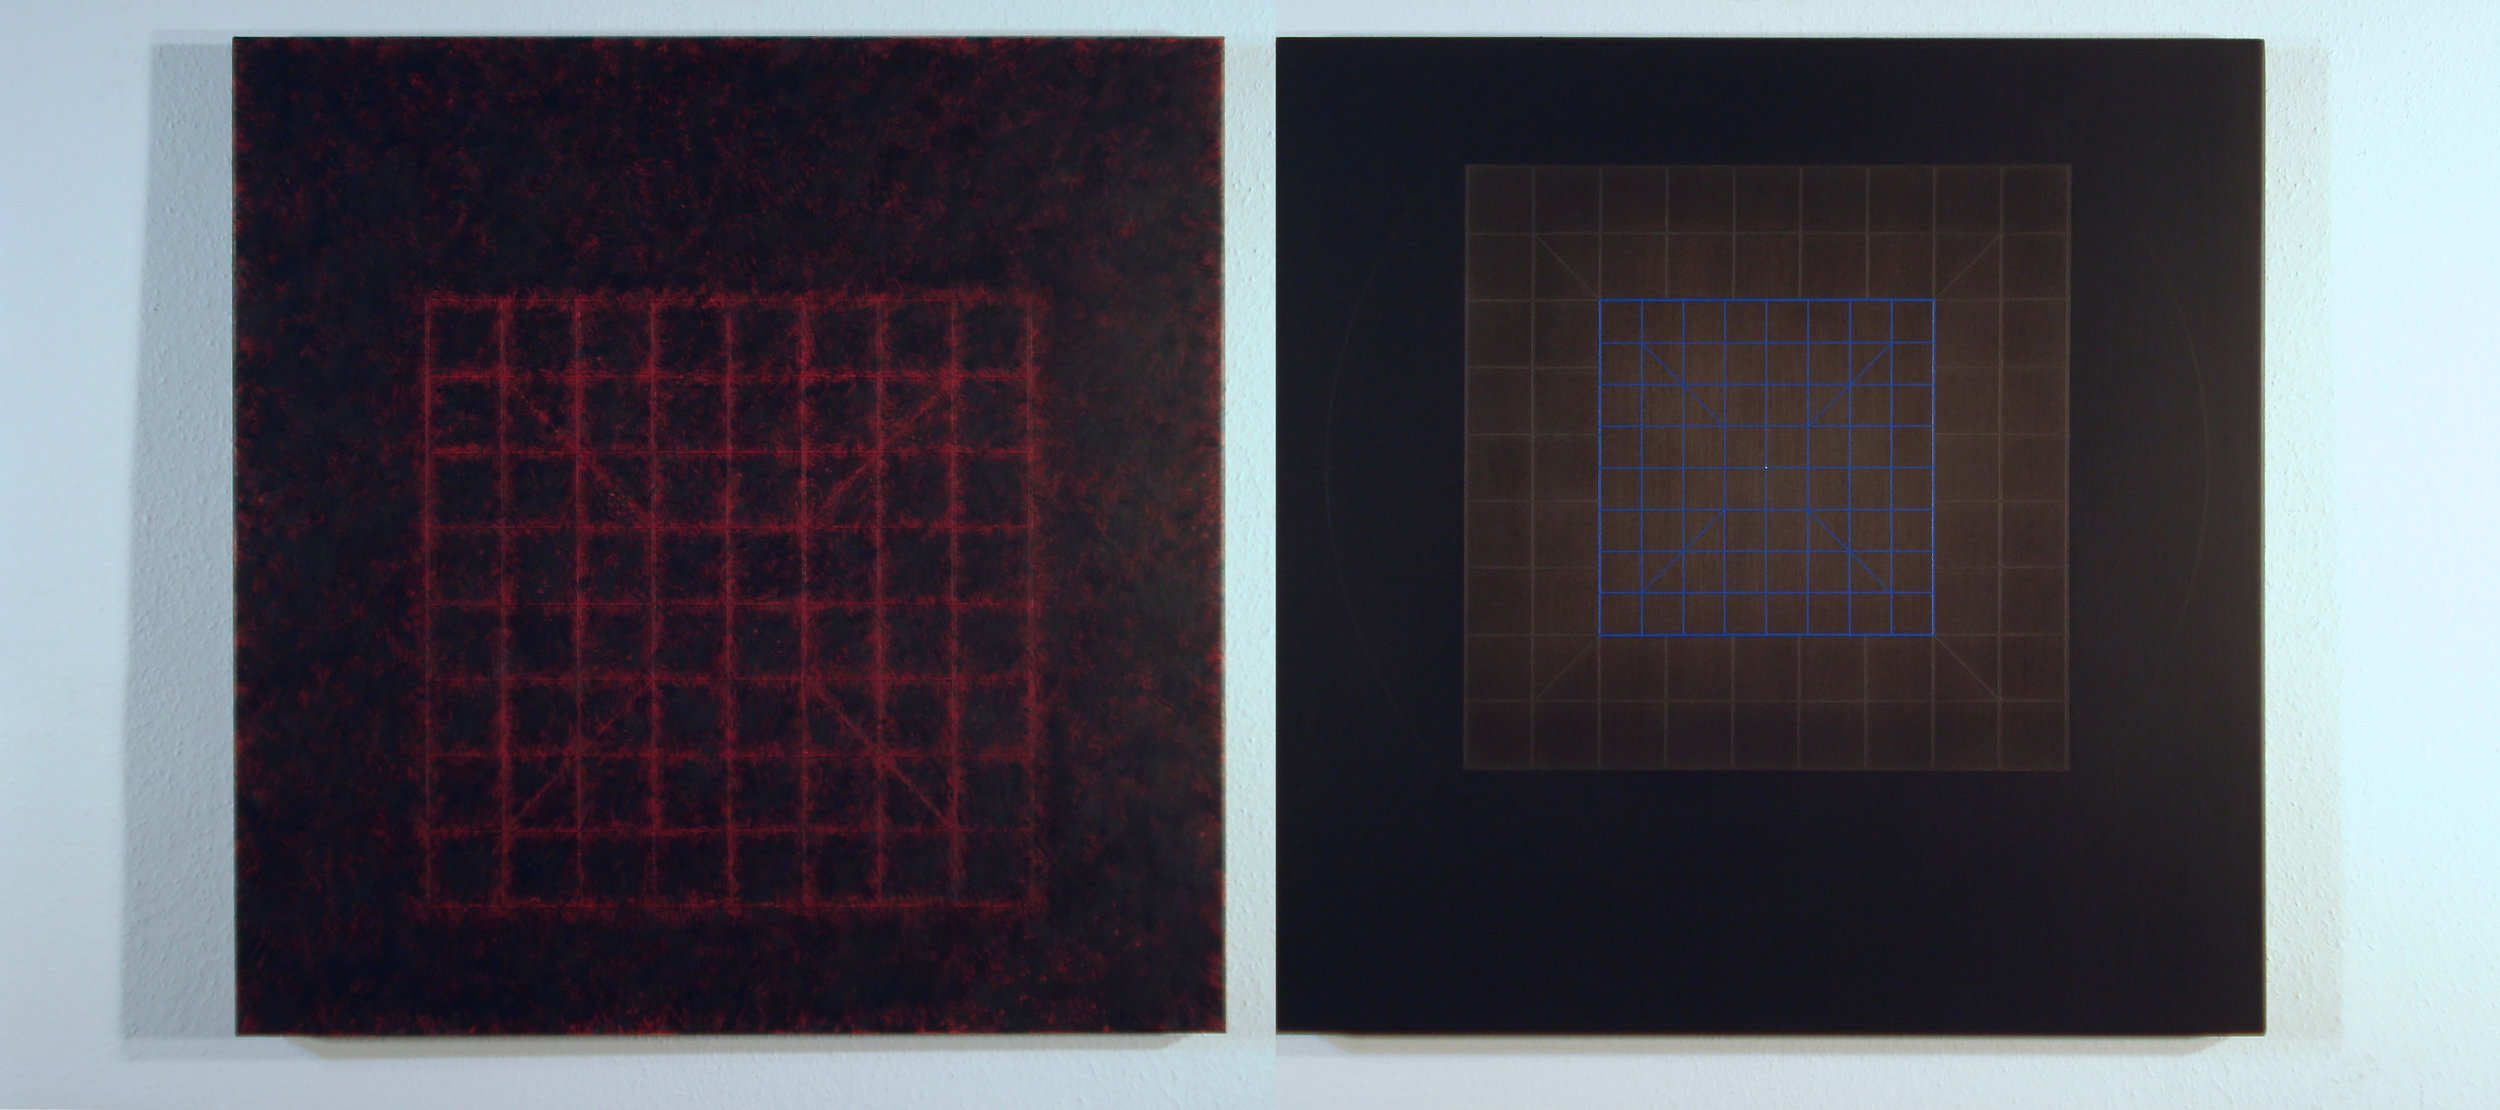 Catharsis-cosmometry-ativarna-brahmana [Diptych-1-2]-[20170926-27], 2017, acrylic on canvas, 17 3/4 x 15 3/4 in. [75x75cm]2x